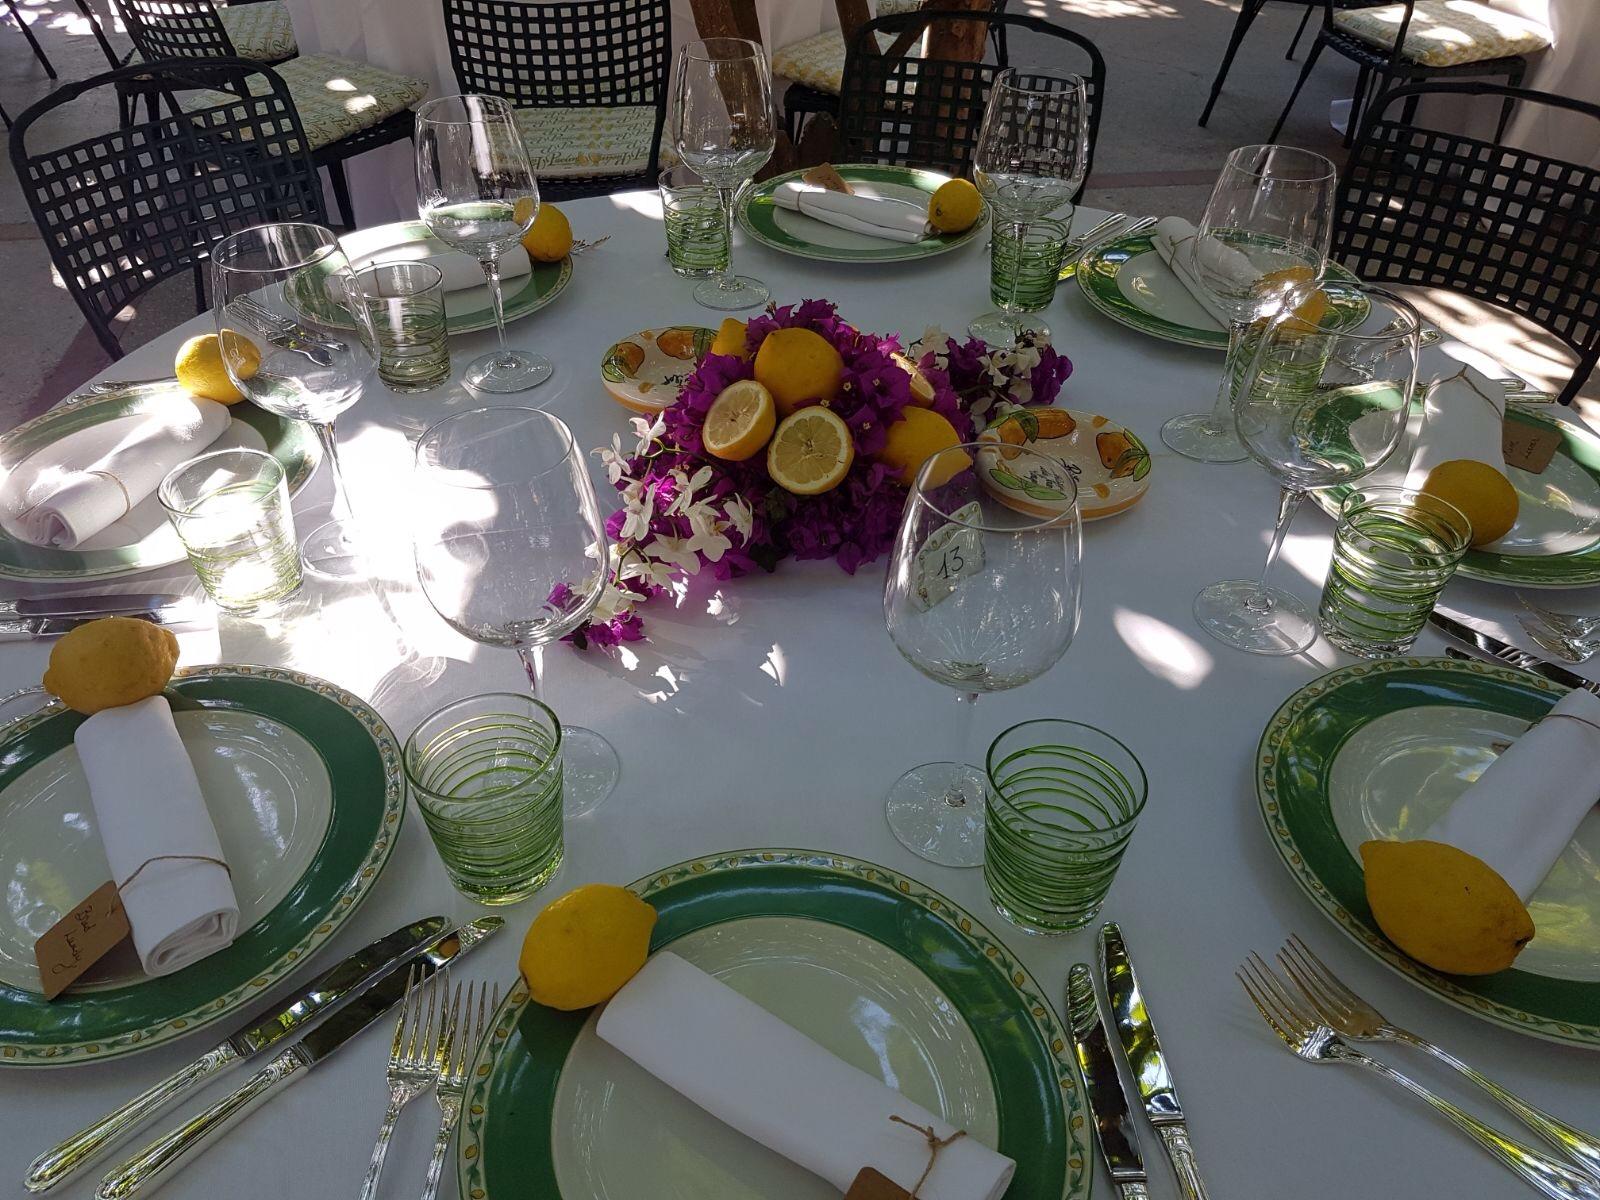 https://www.weddingamalfi.com/wp-content/uploads/Nathalie-and-Benjamin-wedding-day-in-Positano-3.jpg